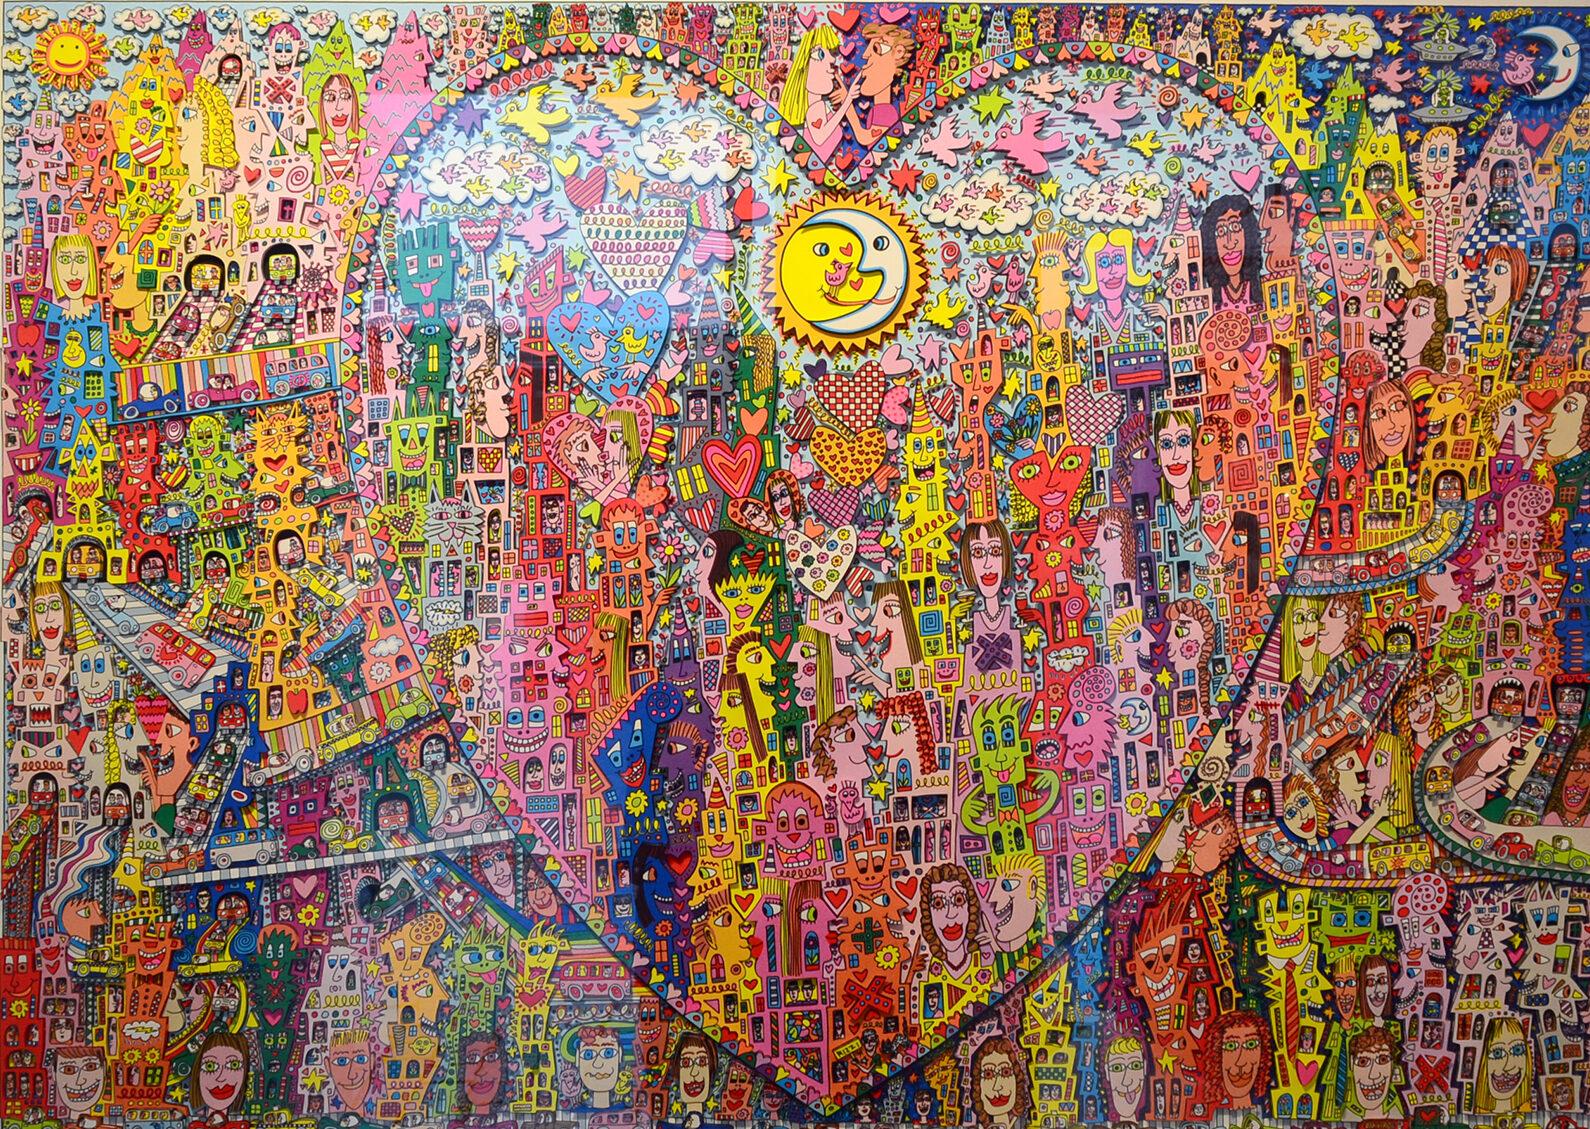 James Rizzi: Wie Kunst das Leben verändert